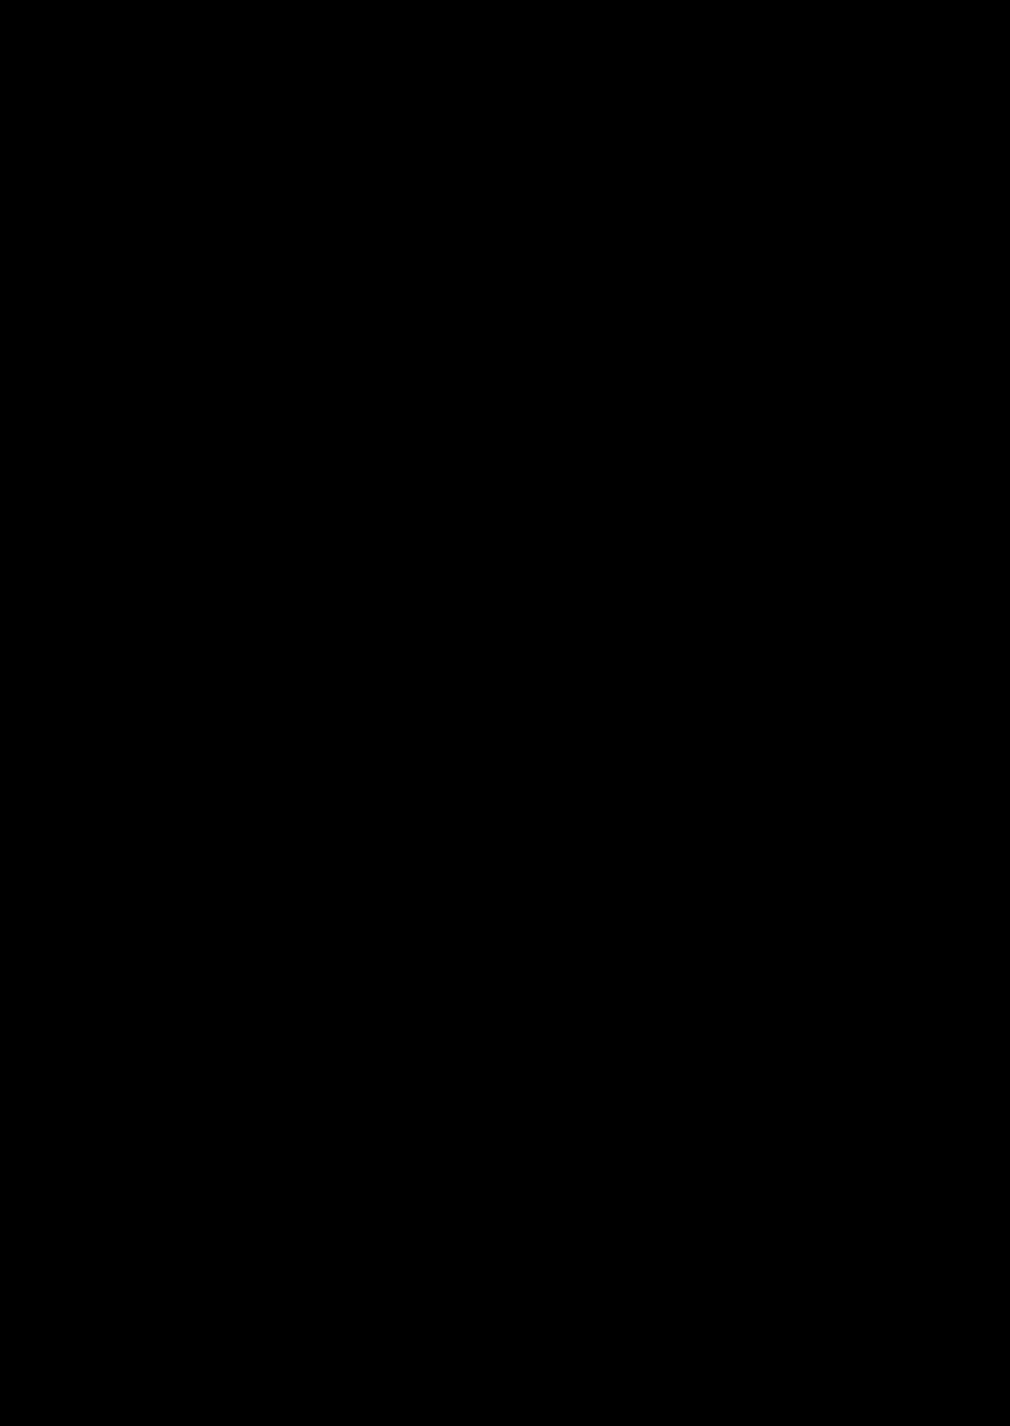 dpat_2020_notification